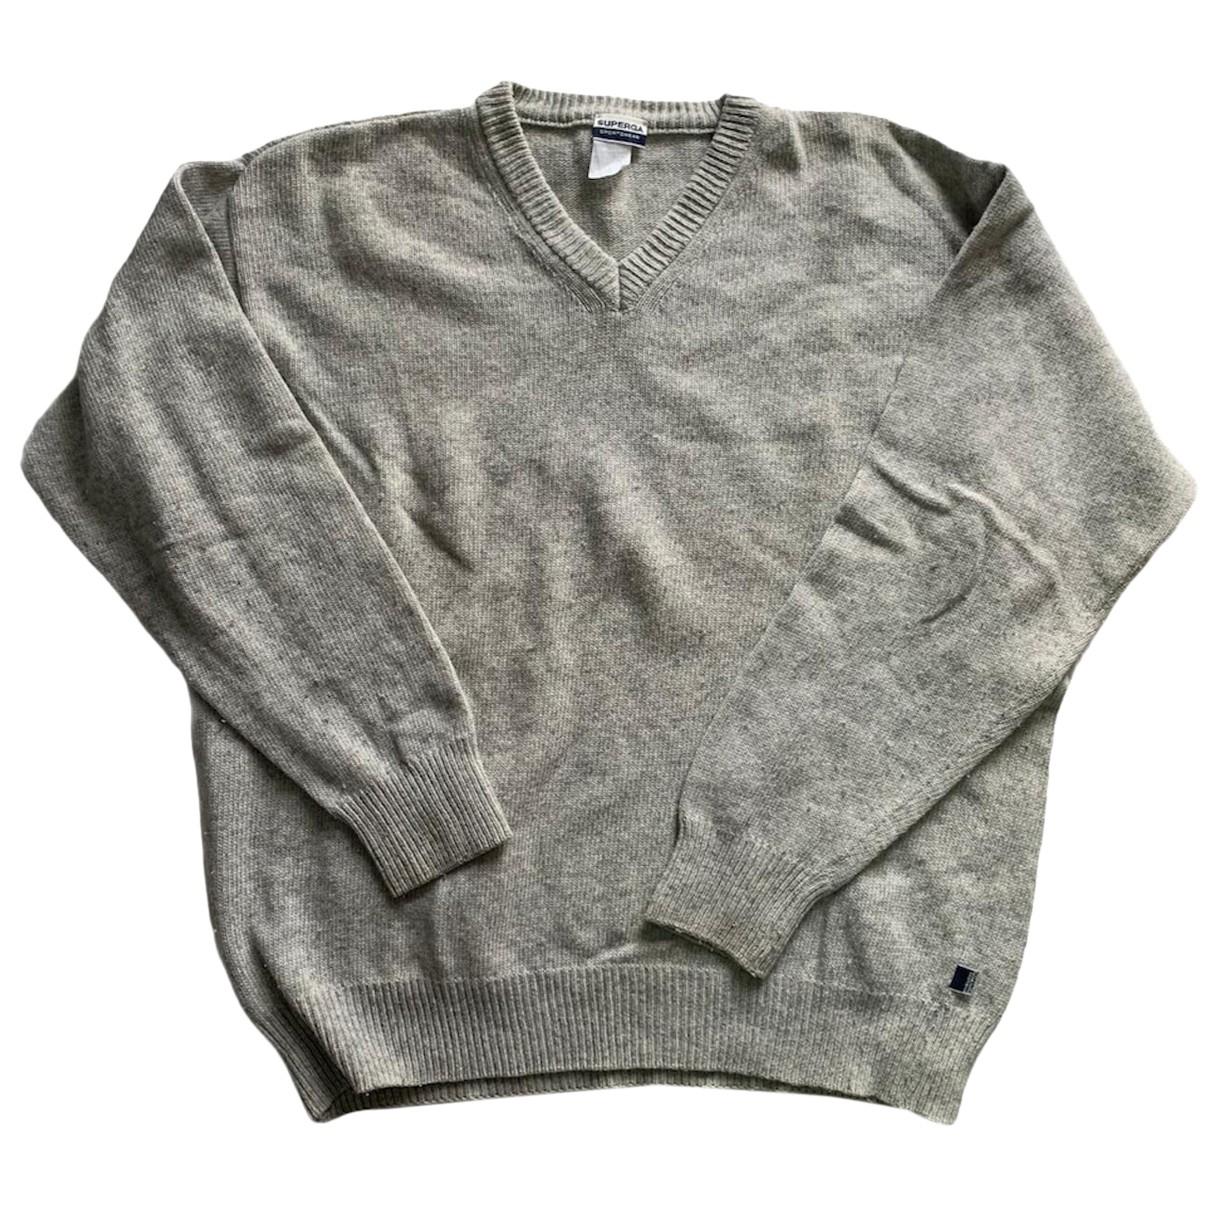 Superga N Grey Cotton Knitwear & Sweatshirts for Men XXL International